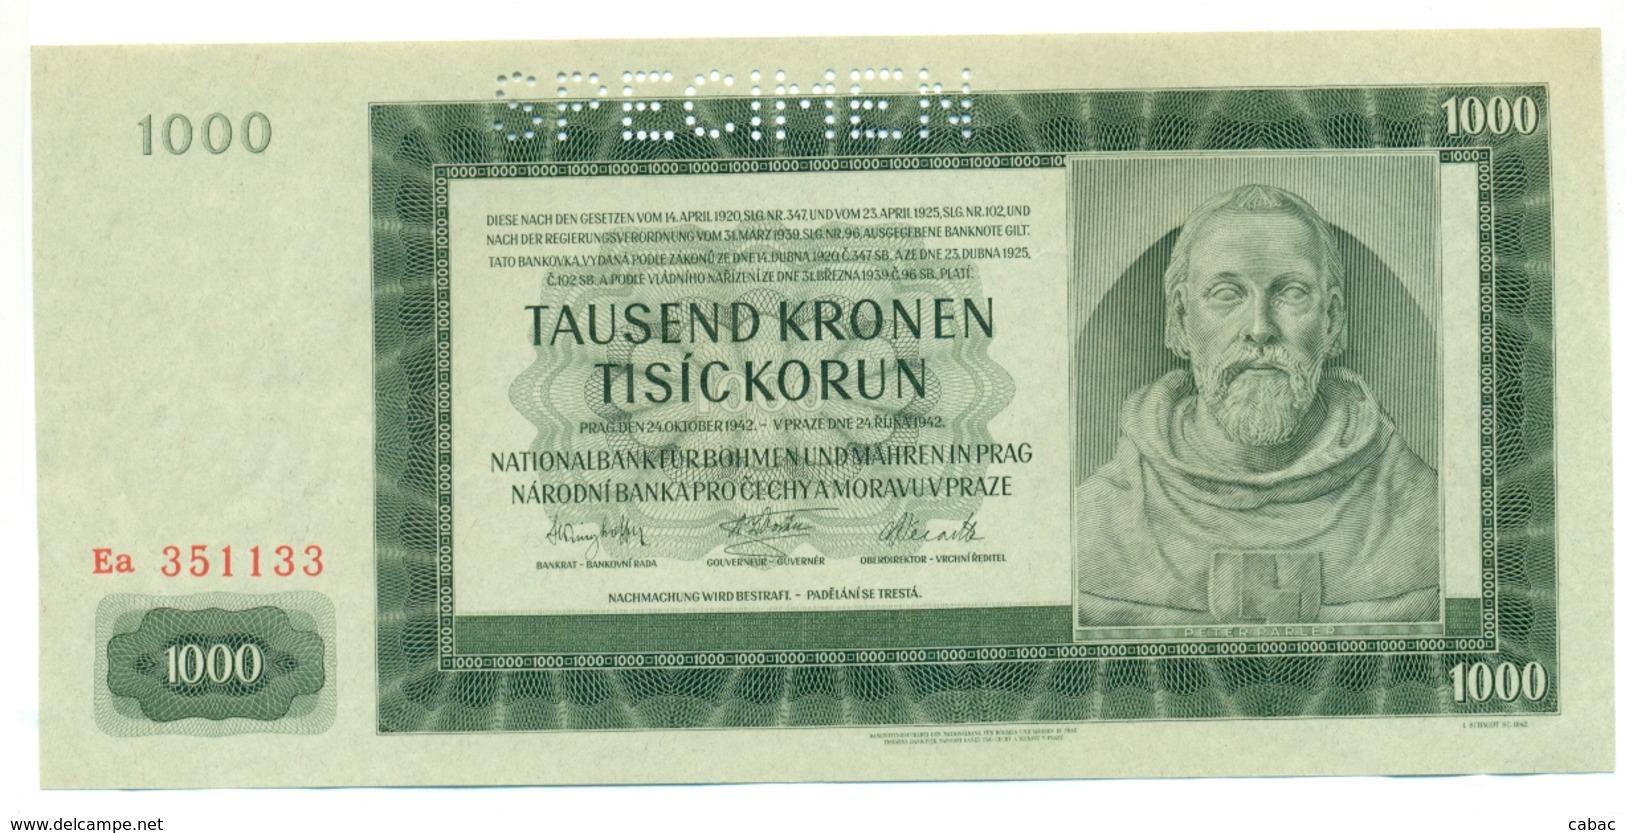 Čechya Morava, Tisict Korun, 1000 Korun, Tausend Kronen, SPECIMEN, 1942 , Serie Ea, Bohemia Moravia - Tchécoslovaquie